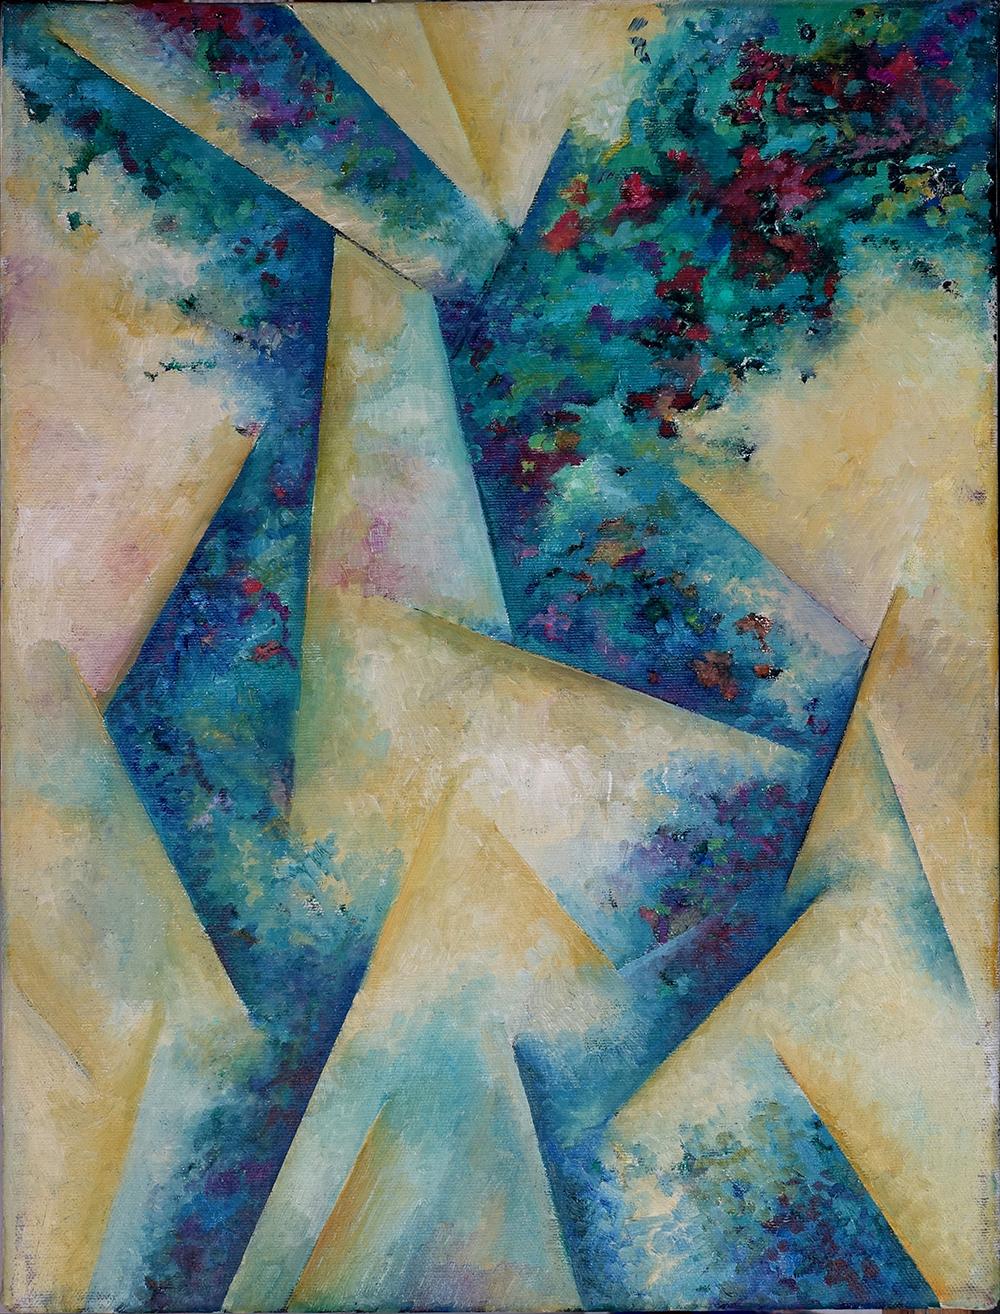 Meditation on Light and Matter (Homage to Ferdinand Leger), Oil on Linen, 40cm x 30cm